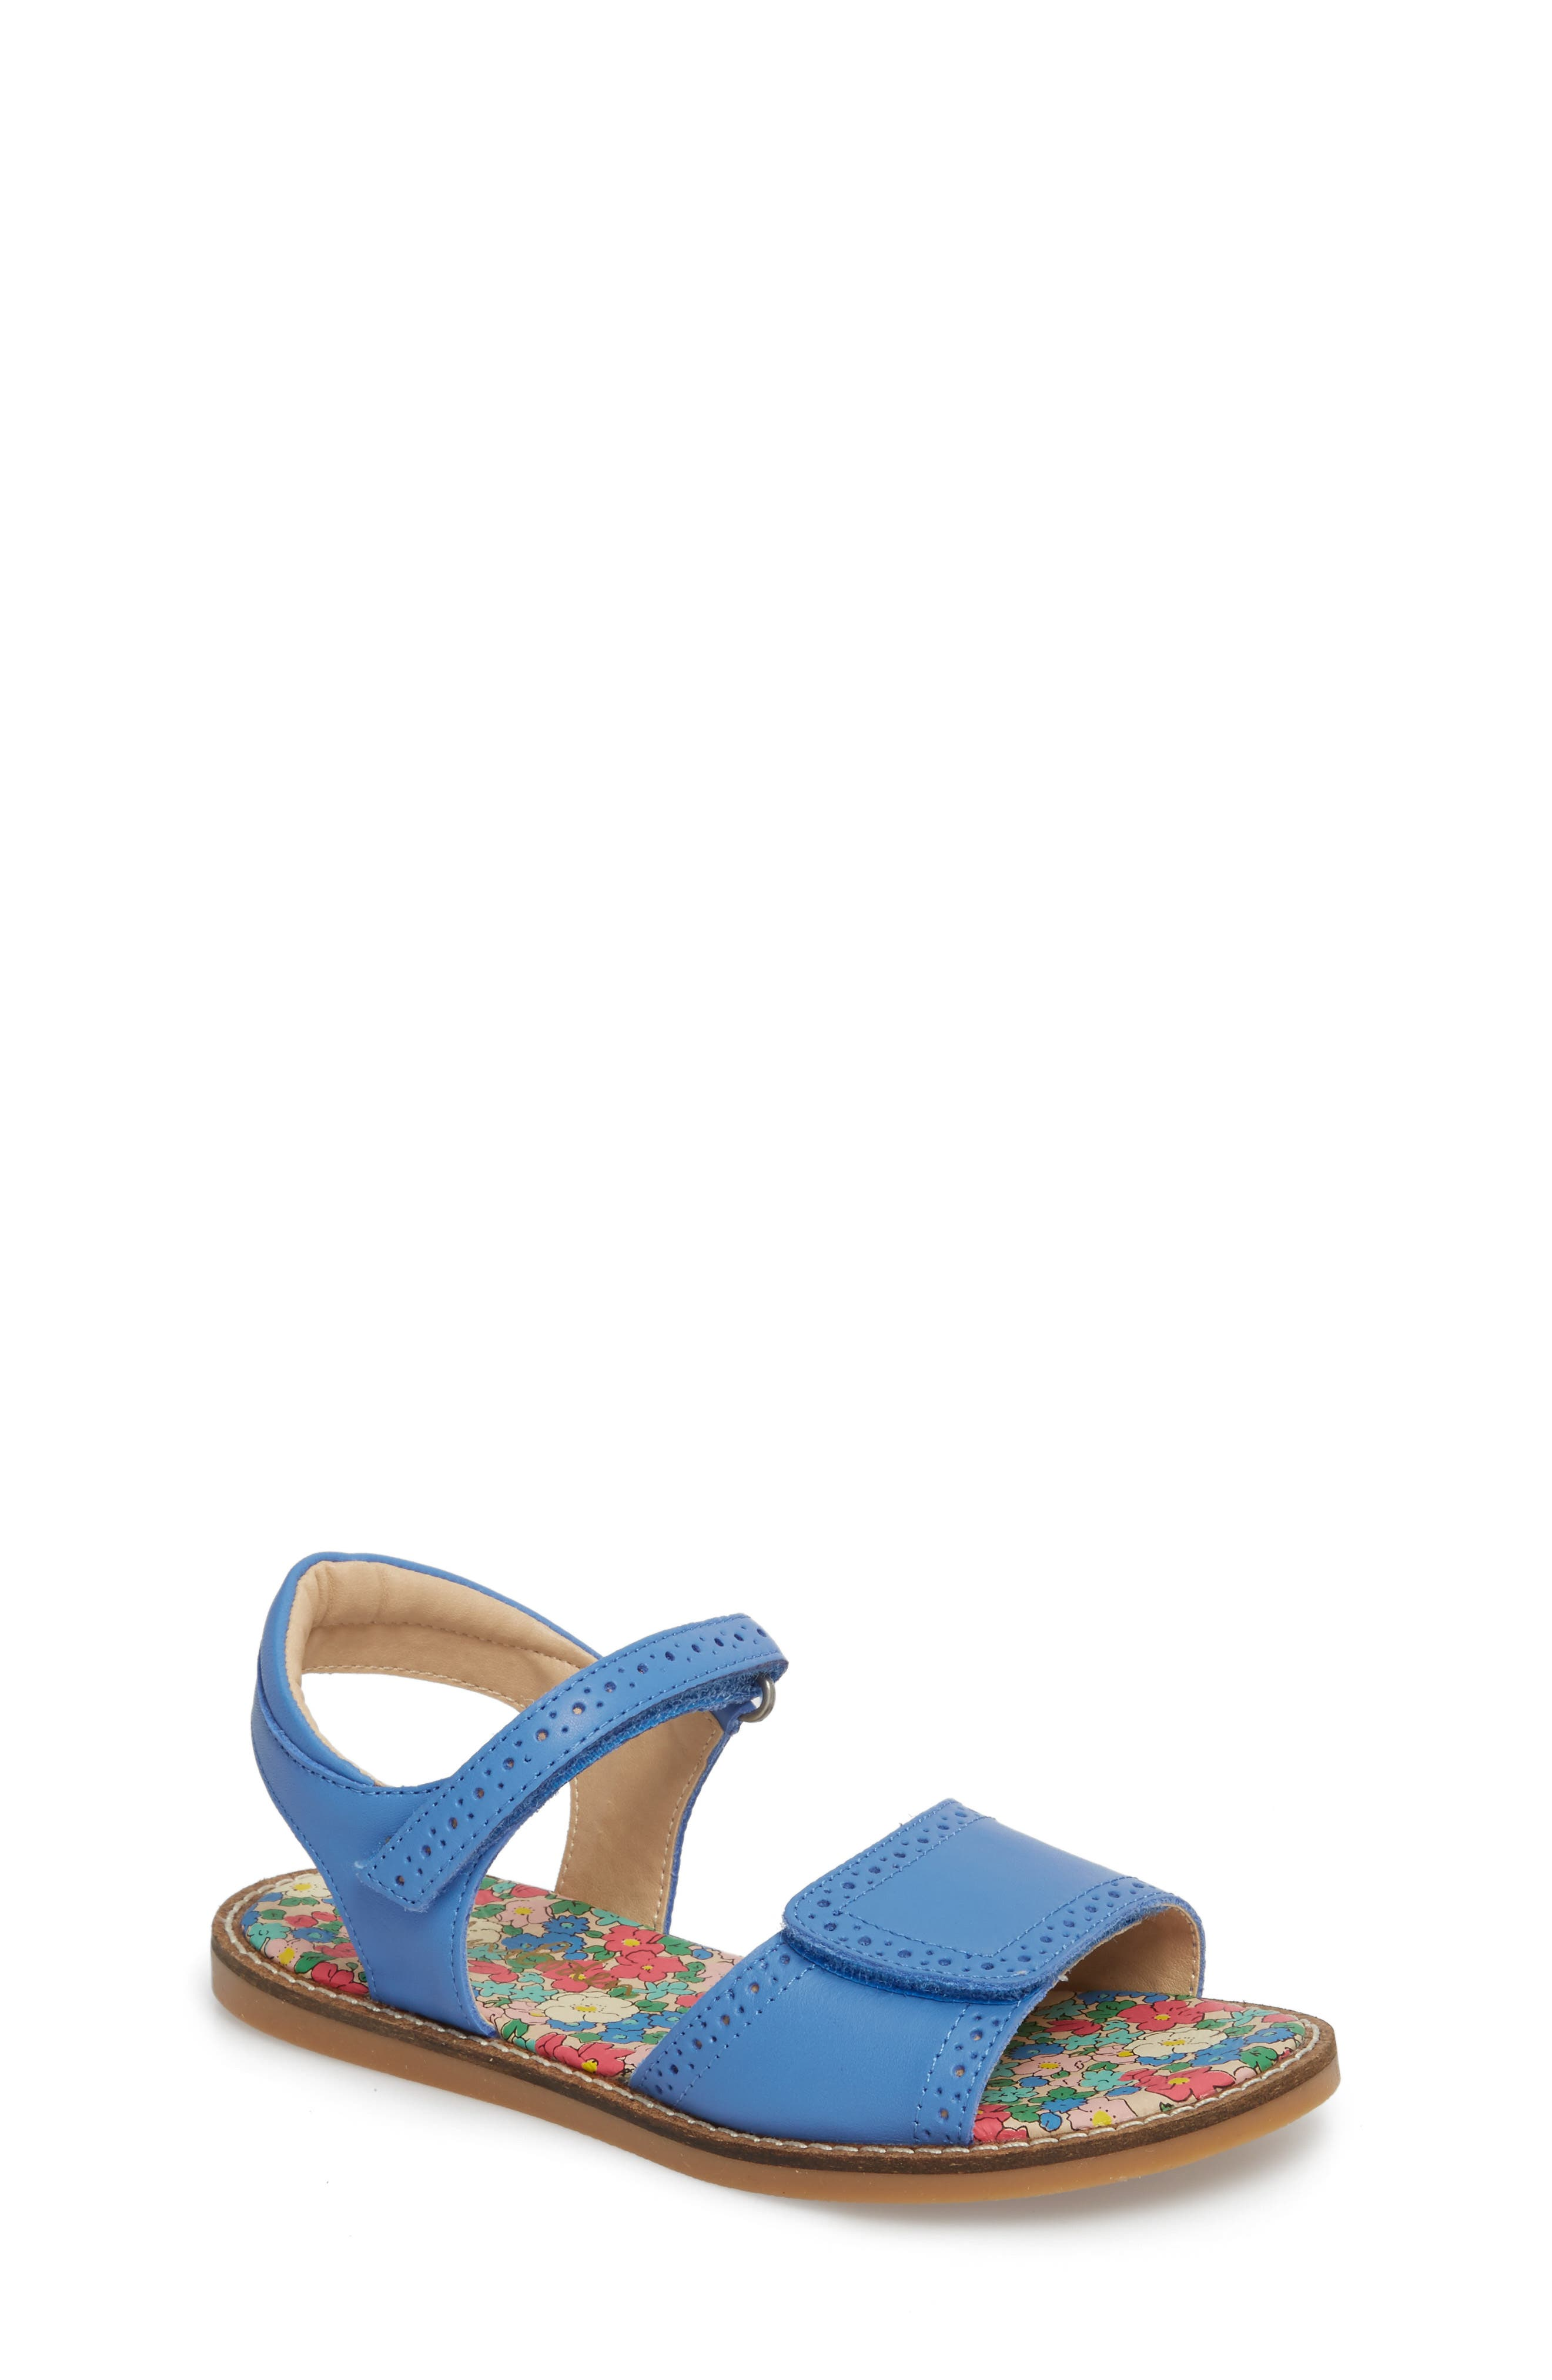 Adjustable Quarter Strap Sandal,                         Main,                         color, Penzance Blue